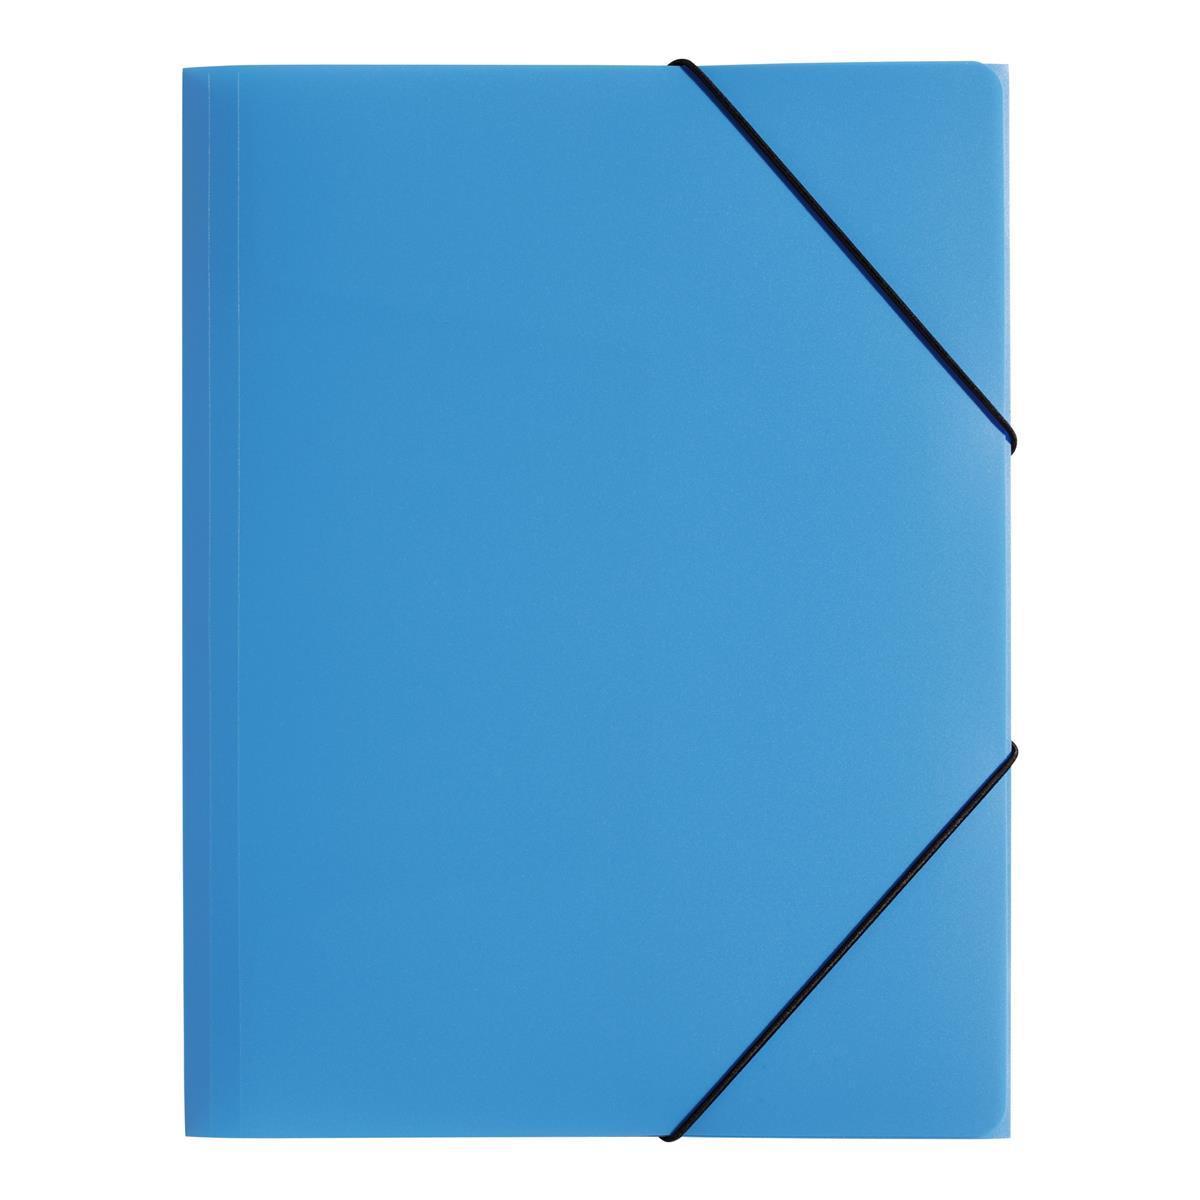 Pagna PP Folder Elasticated Straps Three Internal Flaps A4 Light Blue Ref 2161313 [Pack 10]